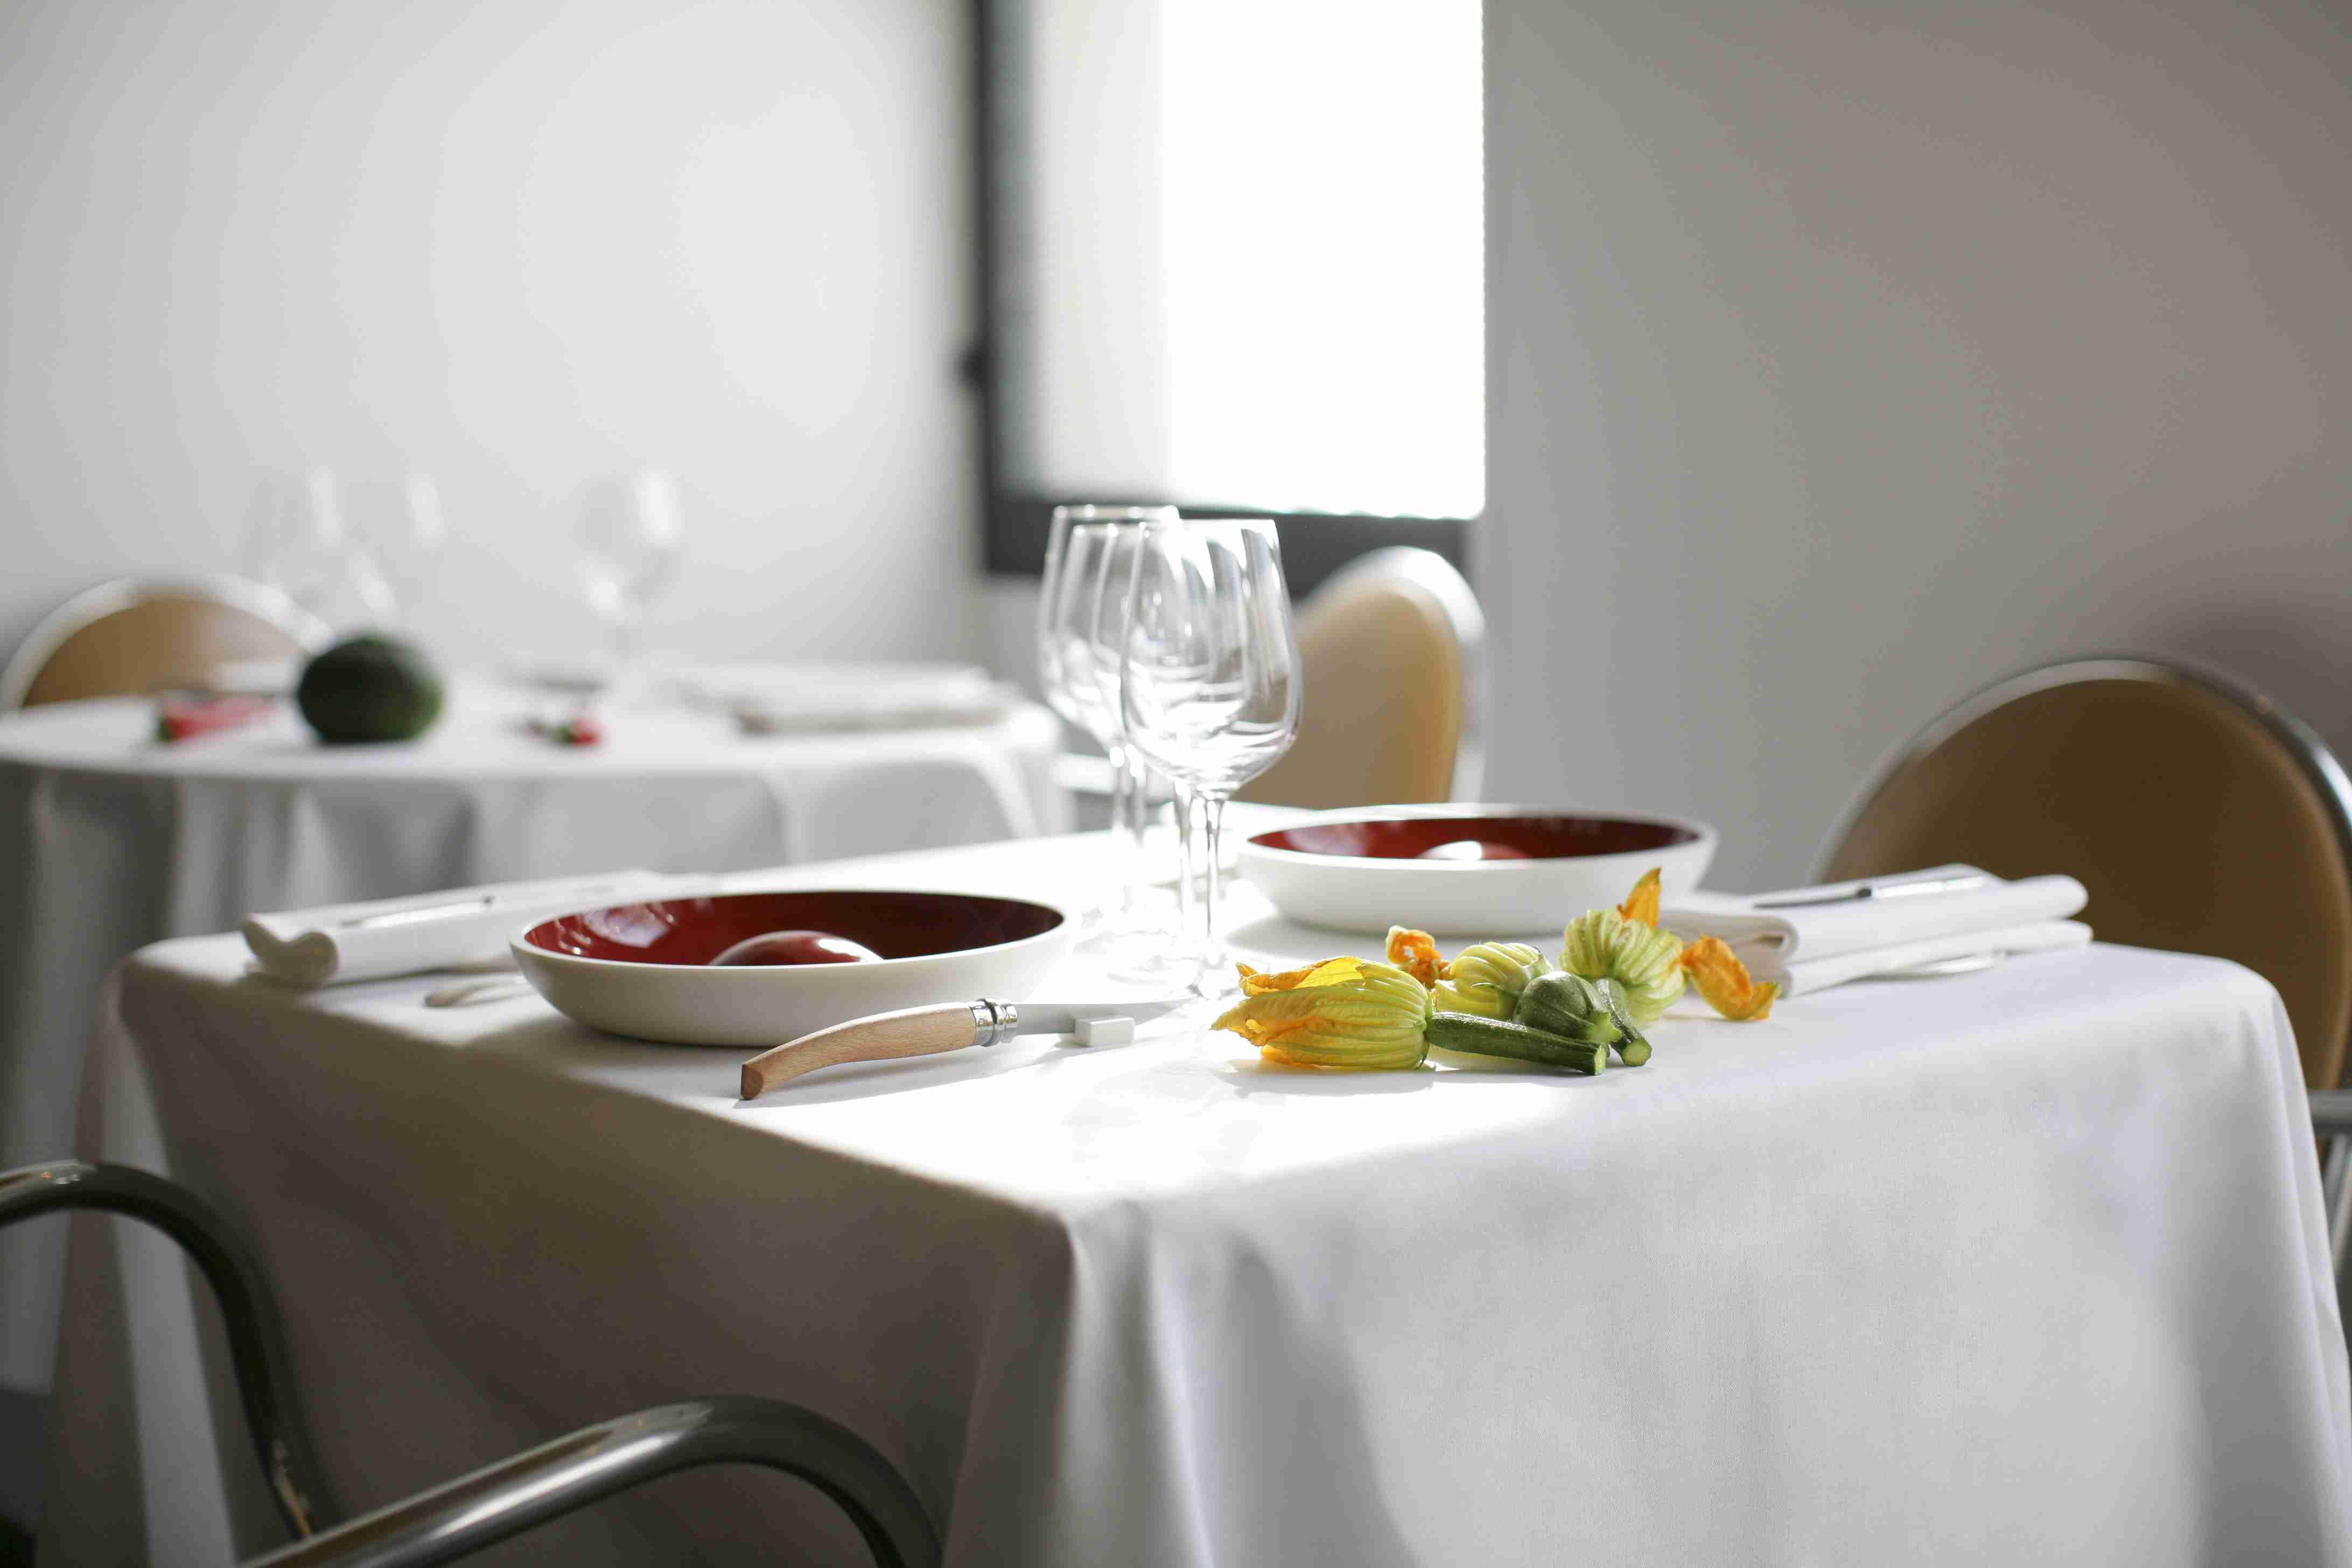 Top Restaurants in Paris With Michelin Stars